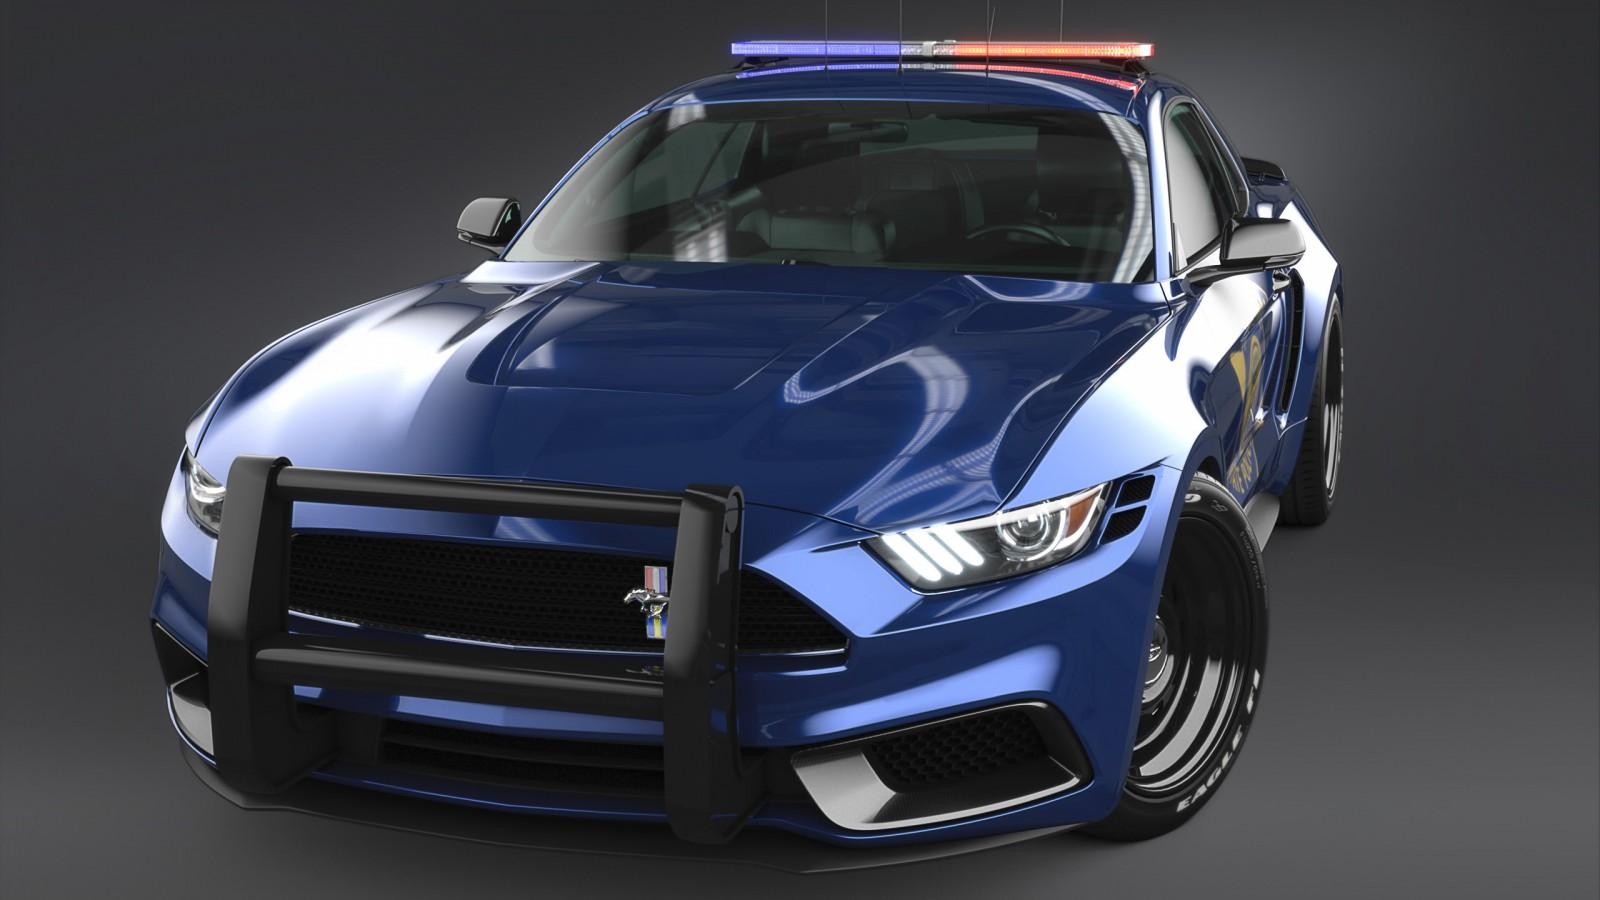 2017 Ford Mustang NotchBack Design Police 3 Wallpaper | HD